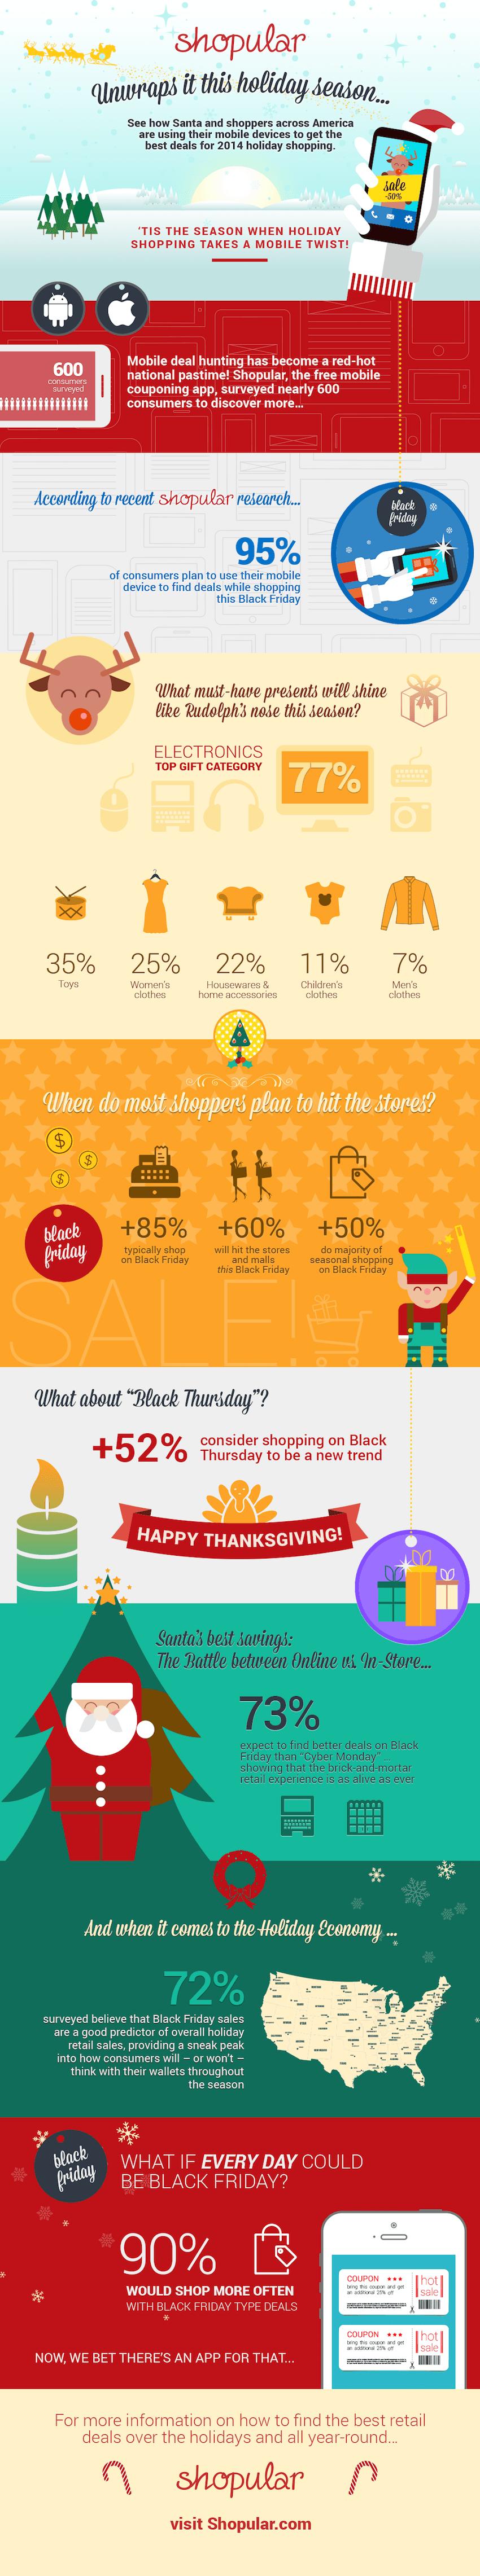 M-commerce en Navidades